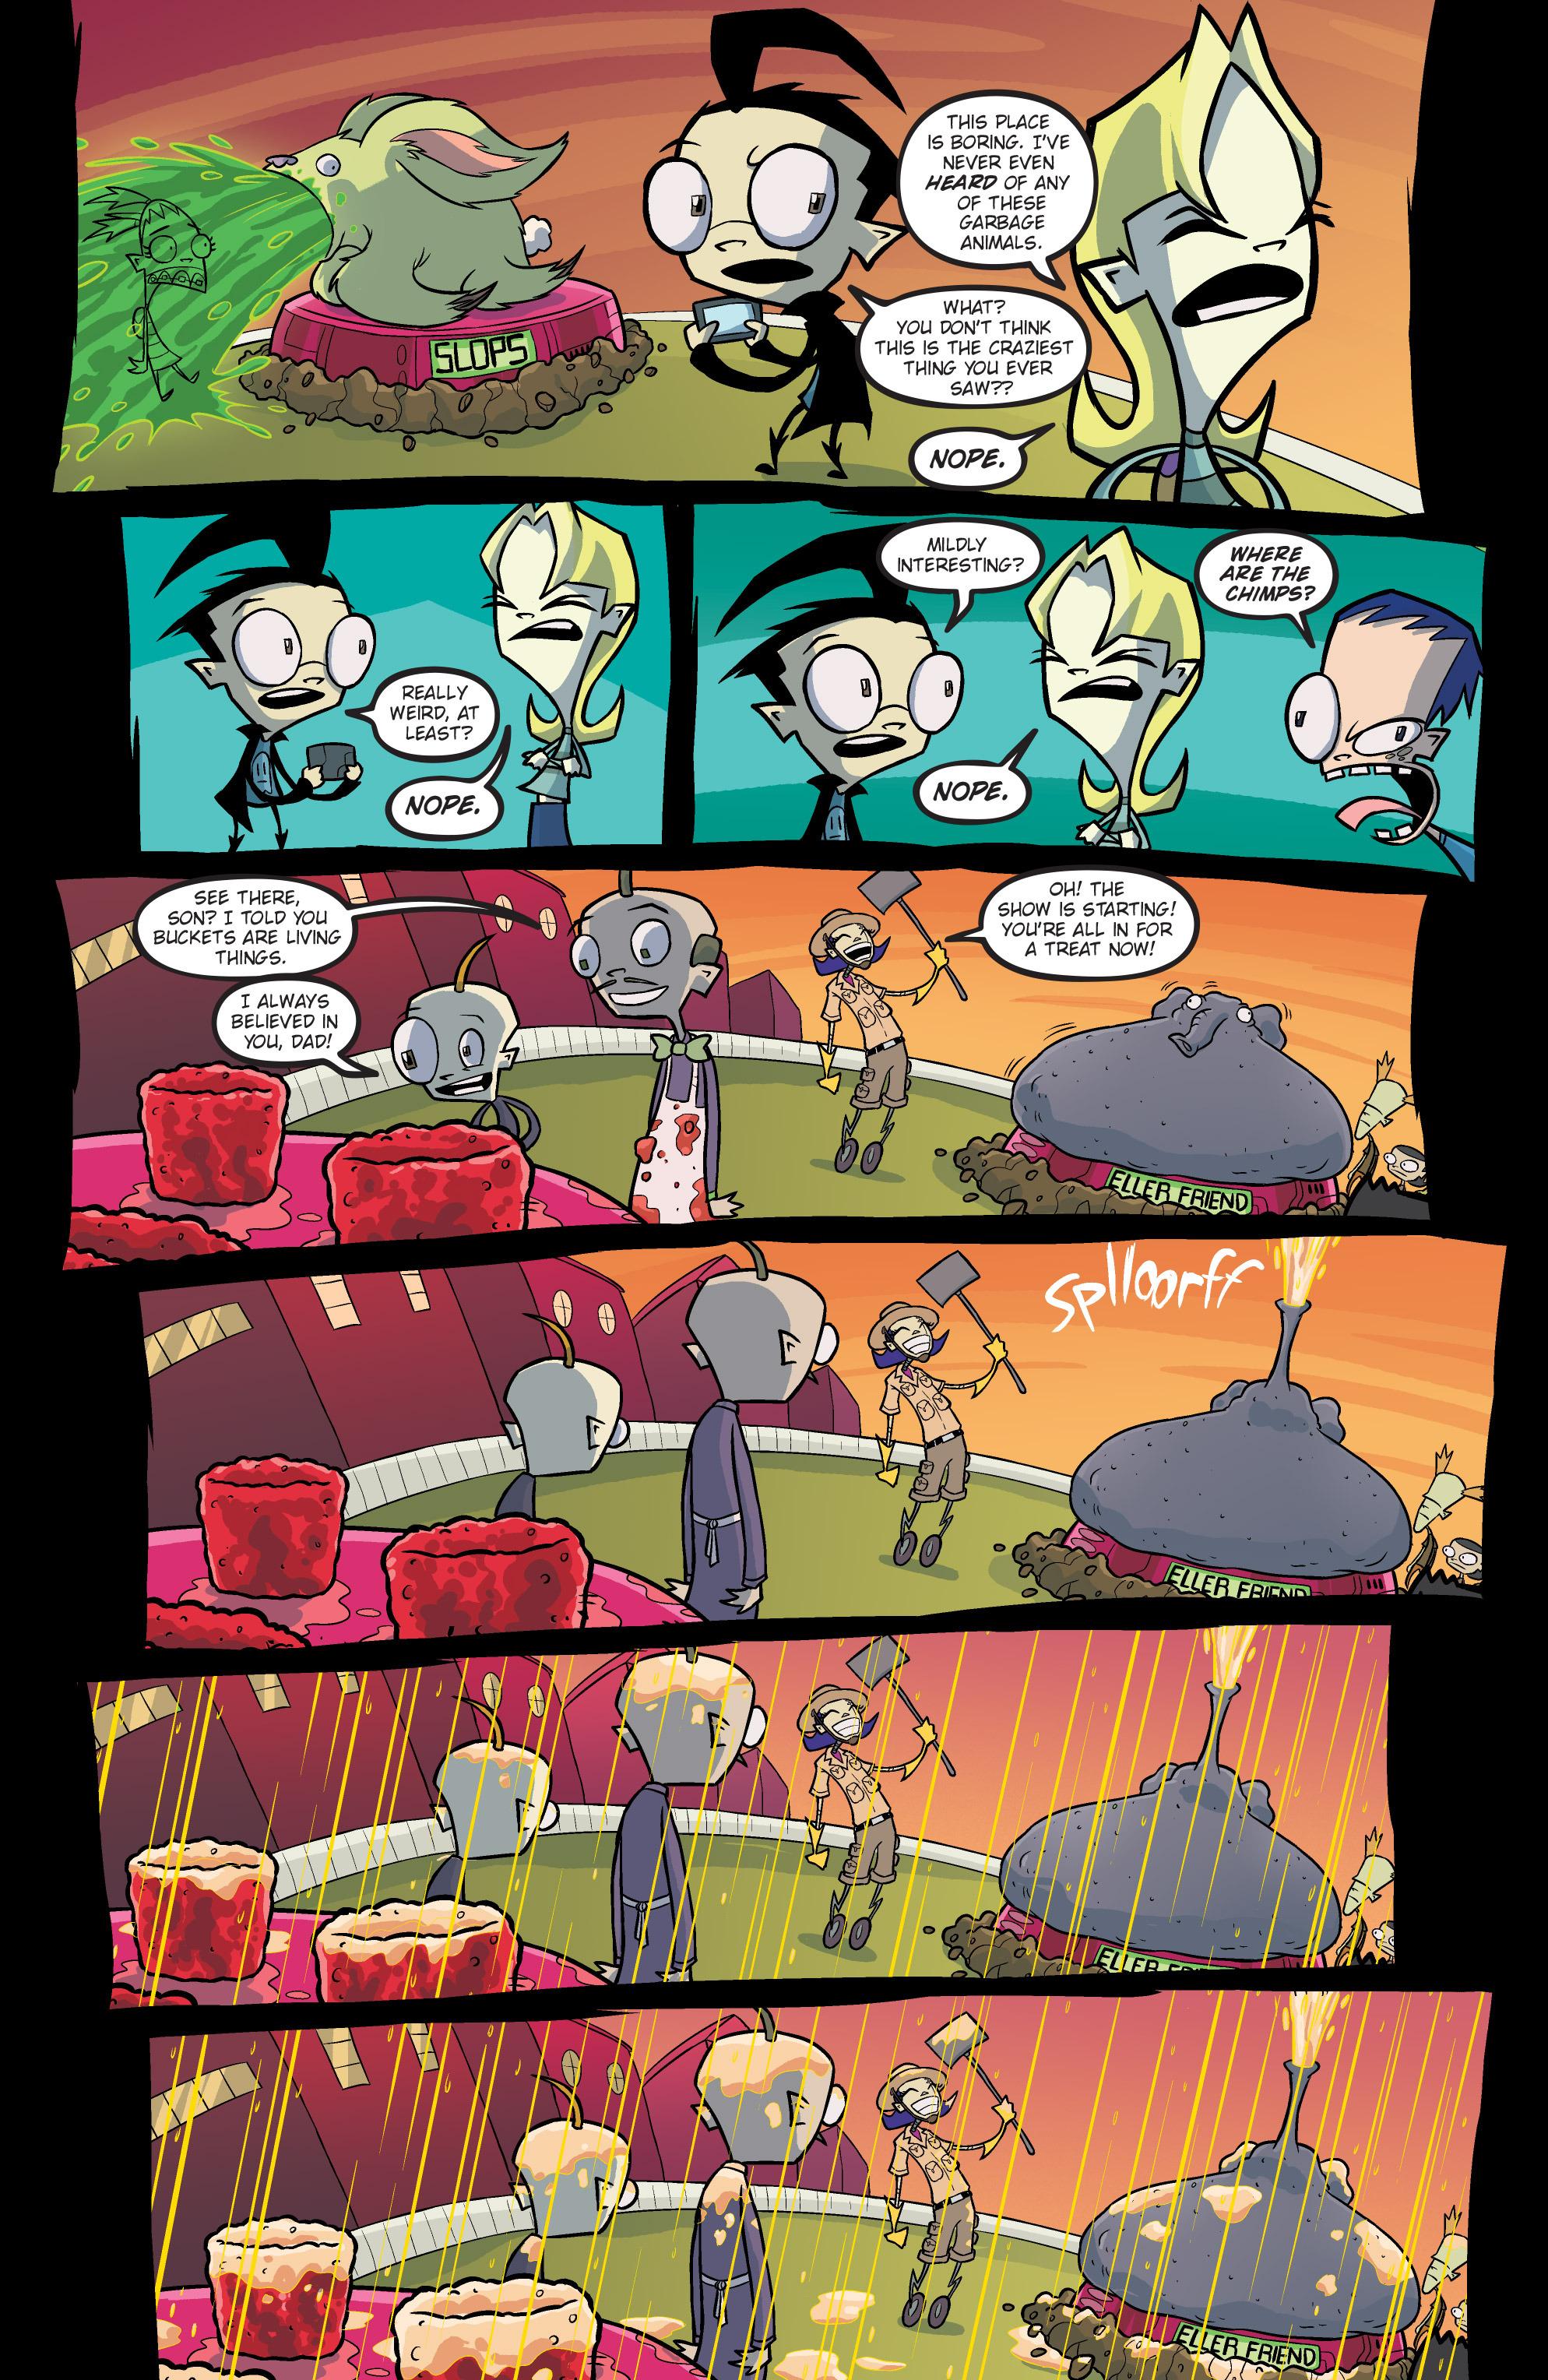 Read online Invader Zim comic -  Issue #19 - 10